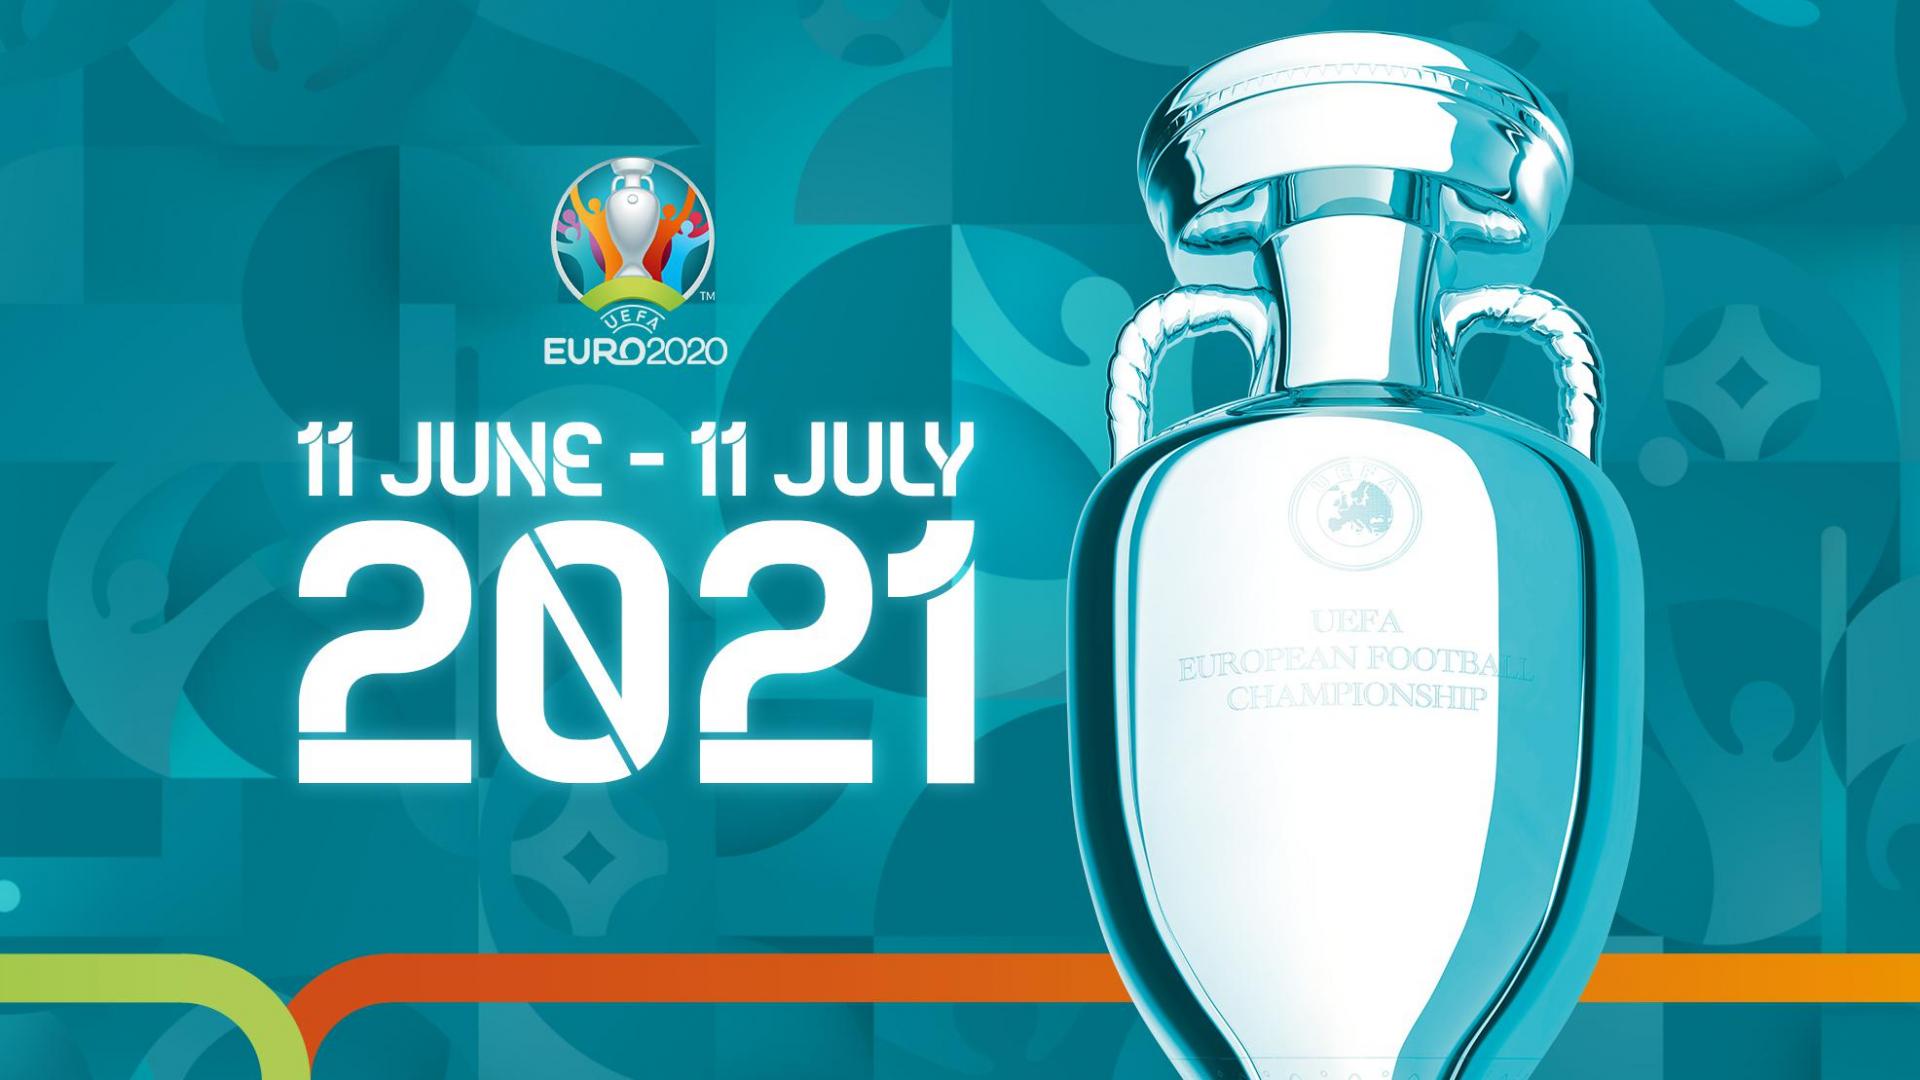 UEFA EURO 2020 match schedule: fixtures, venues and 2021 tournament